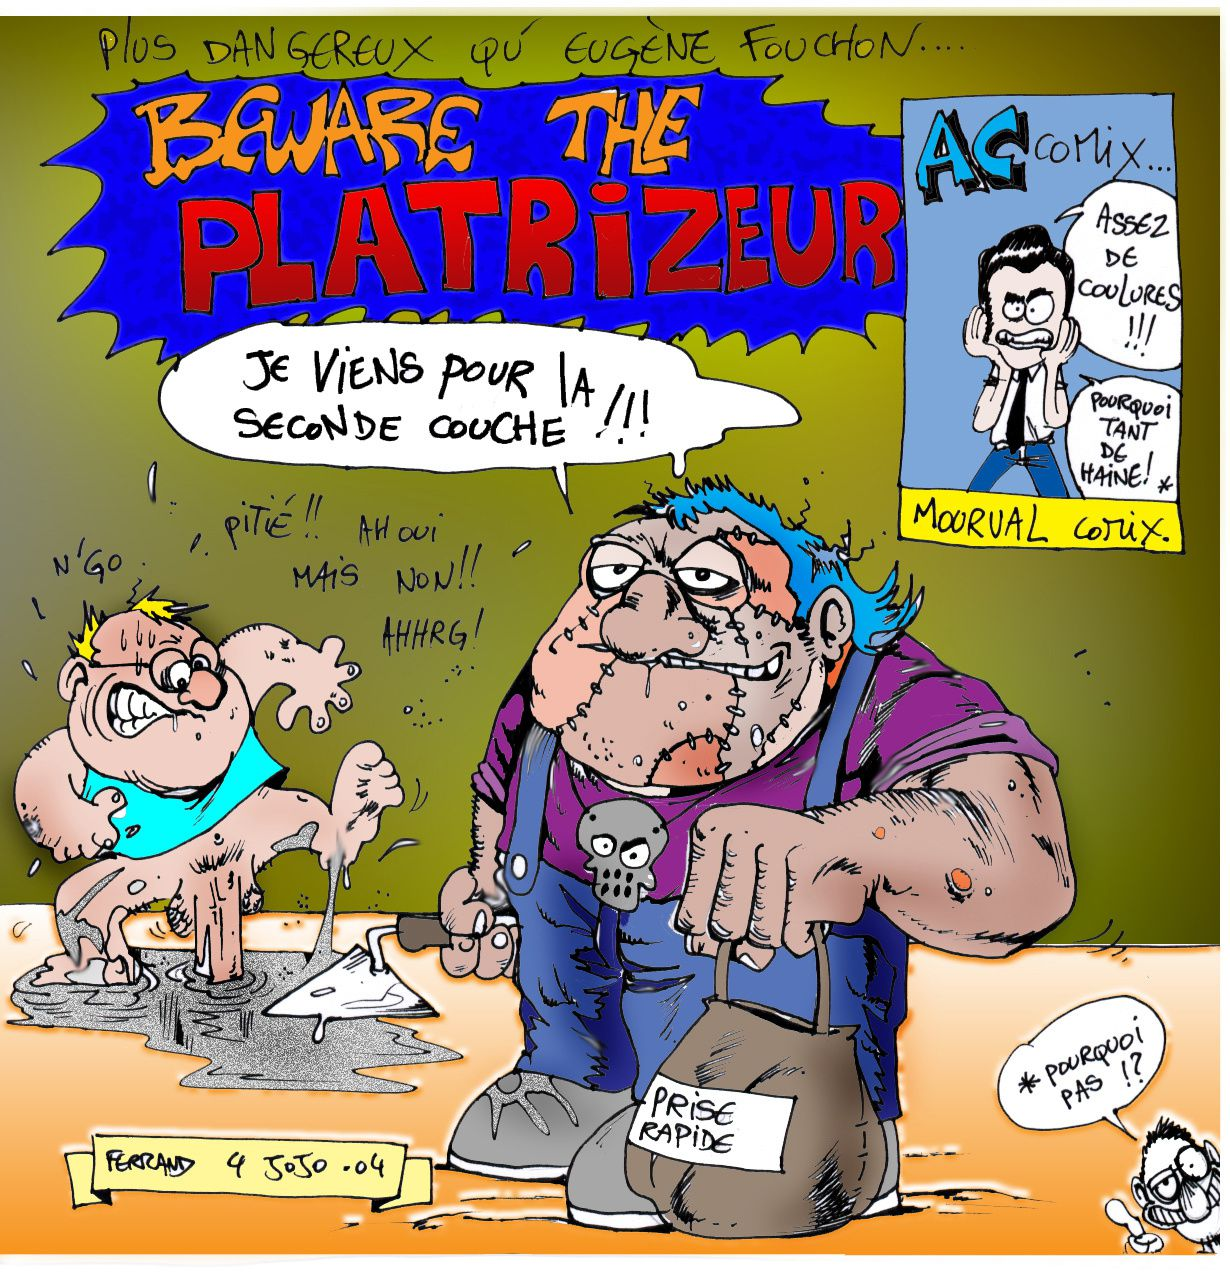 Beware the platrizer (eugene fouchon)